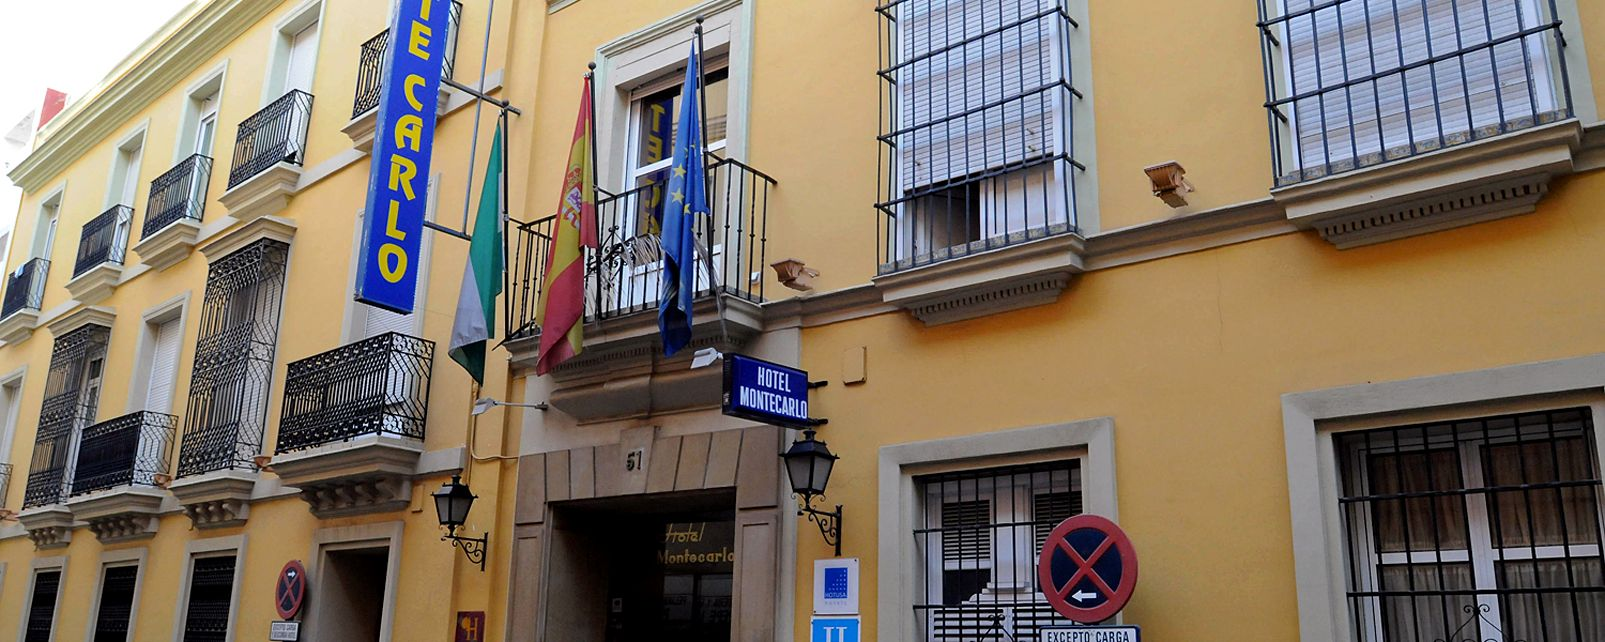 Hôtel Montecarlo